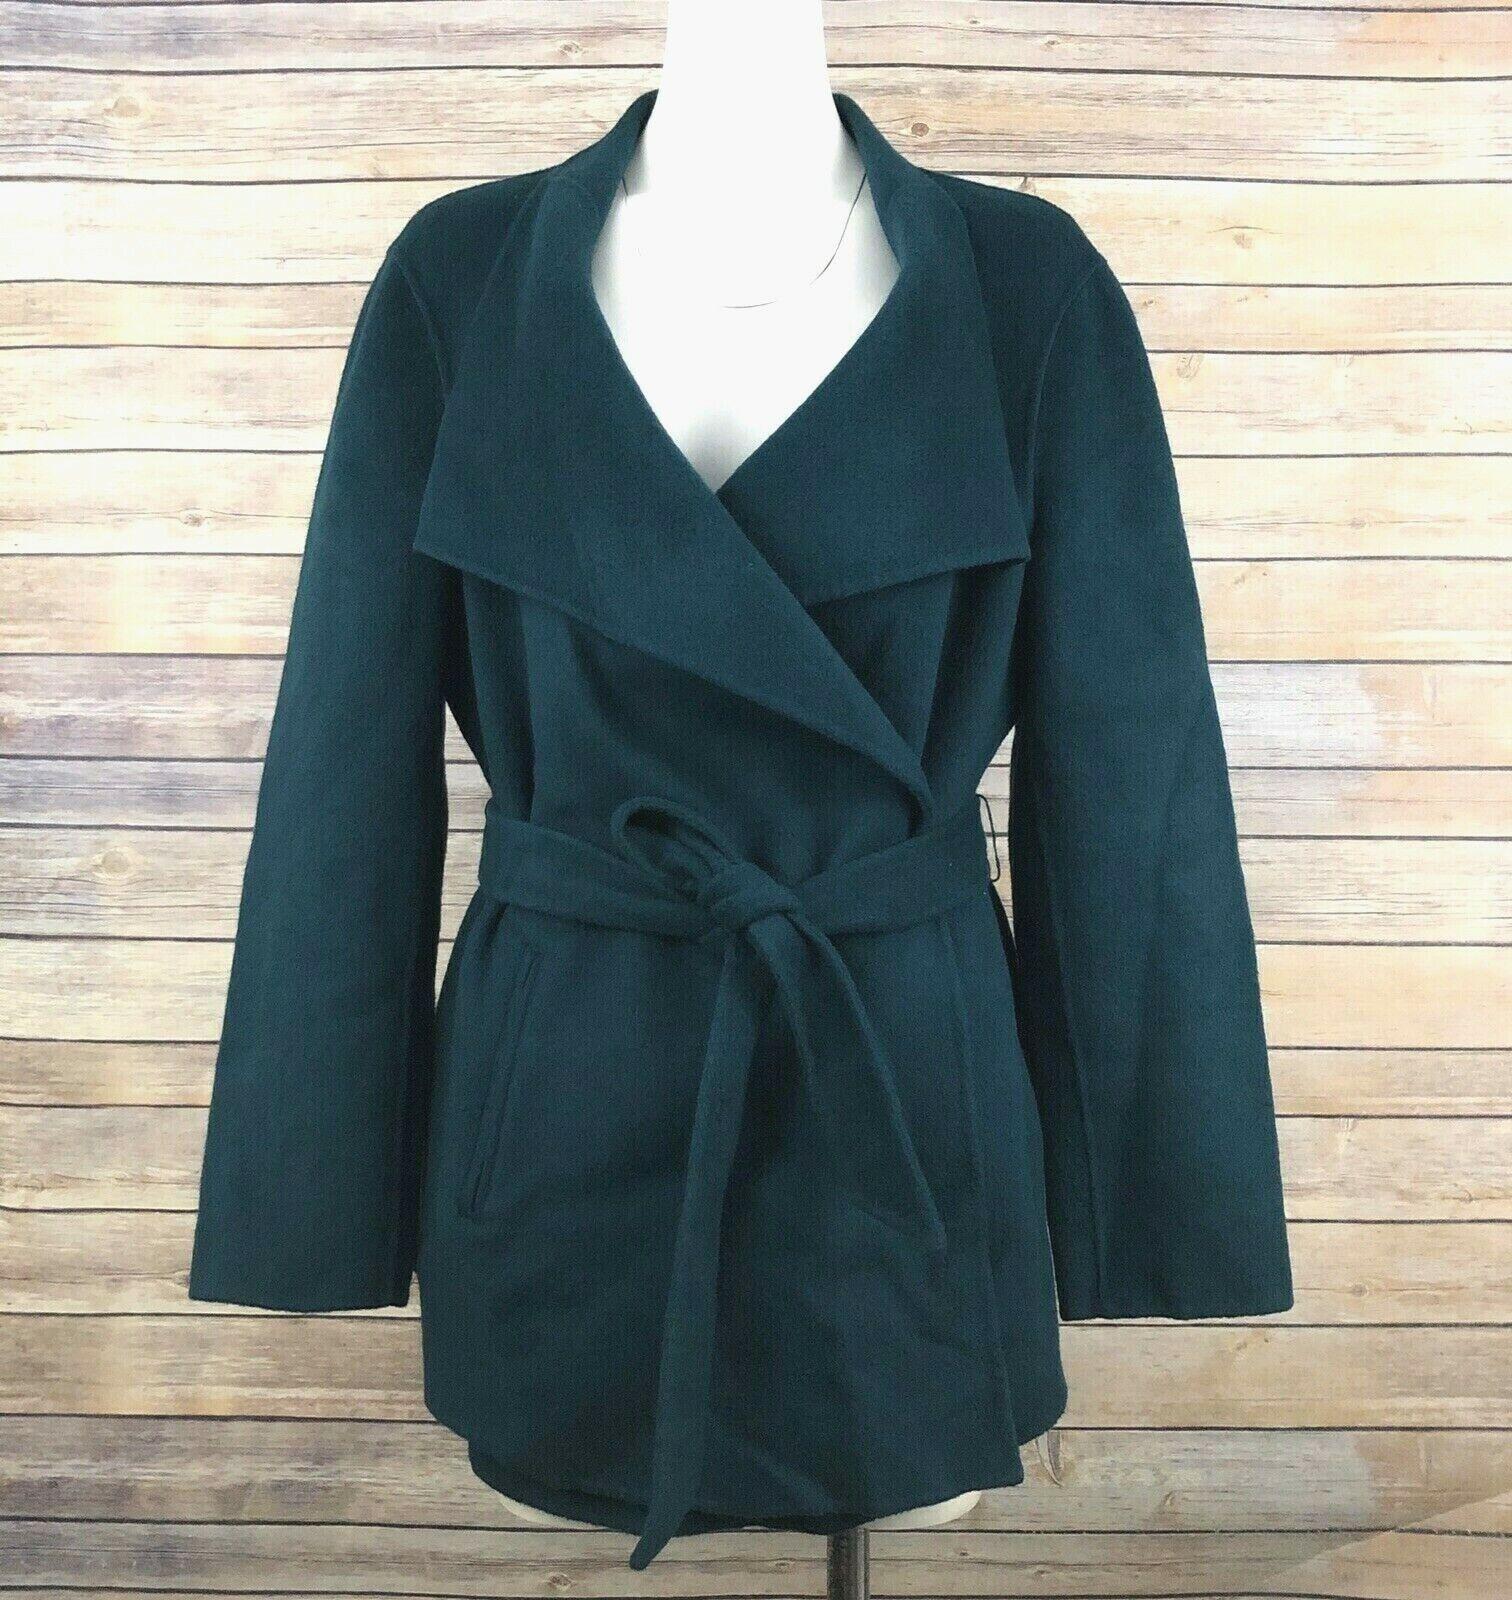 J. Jill Wool Angora Rabbit Hair Blend Coat Jacket SZ L Teal Solid Belted Pockets